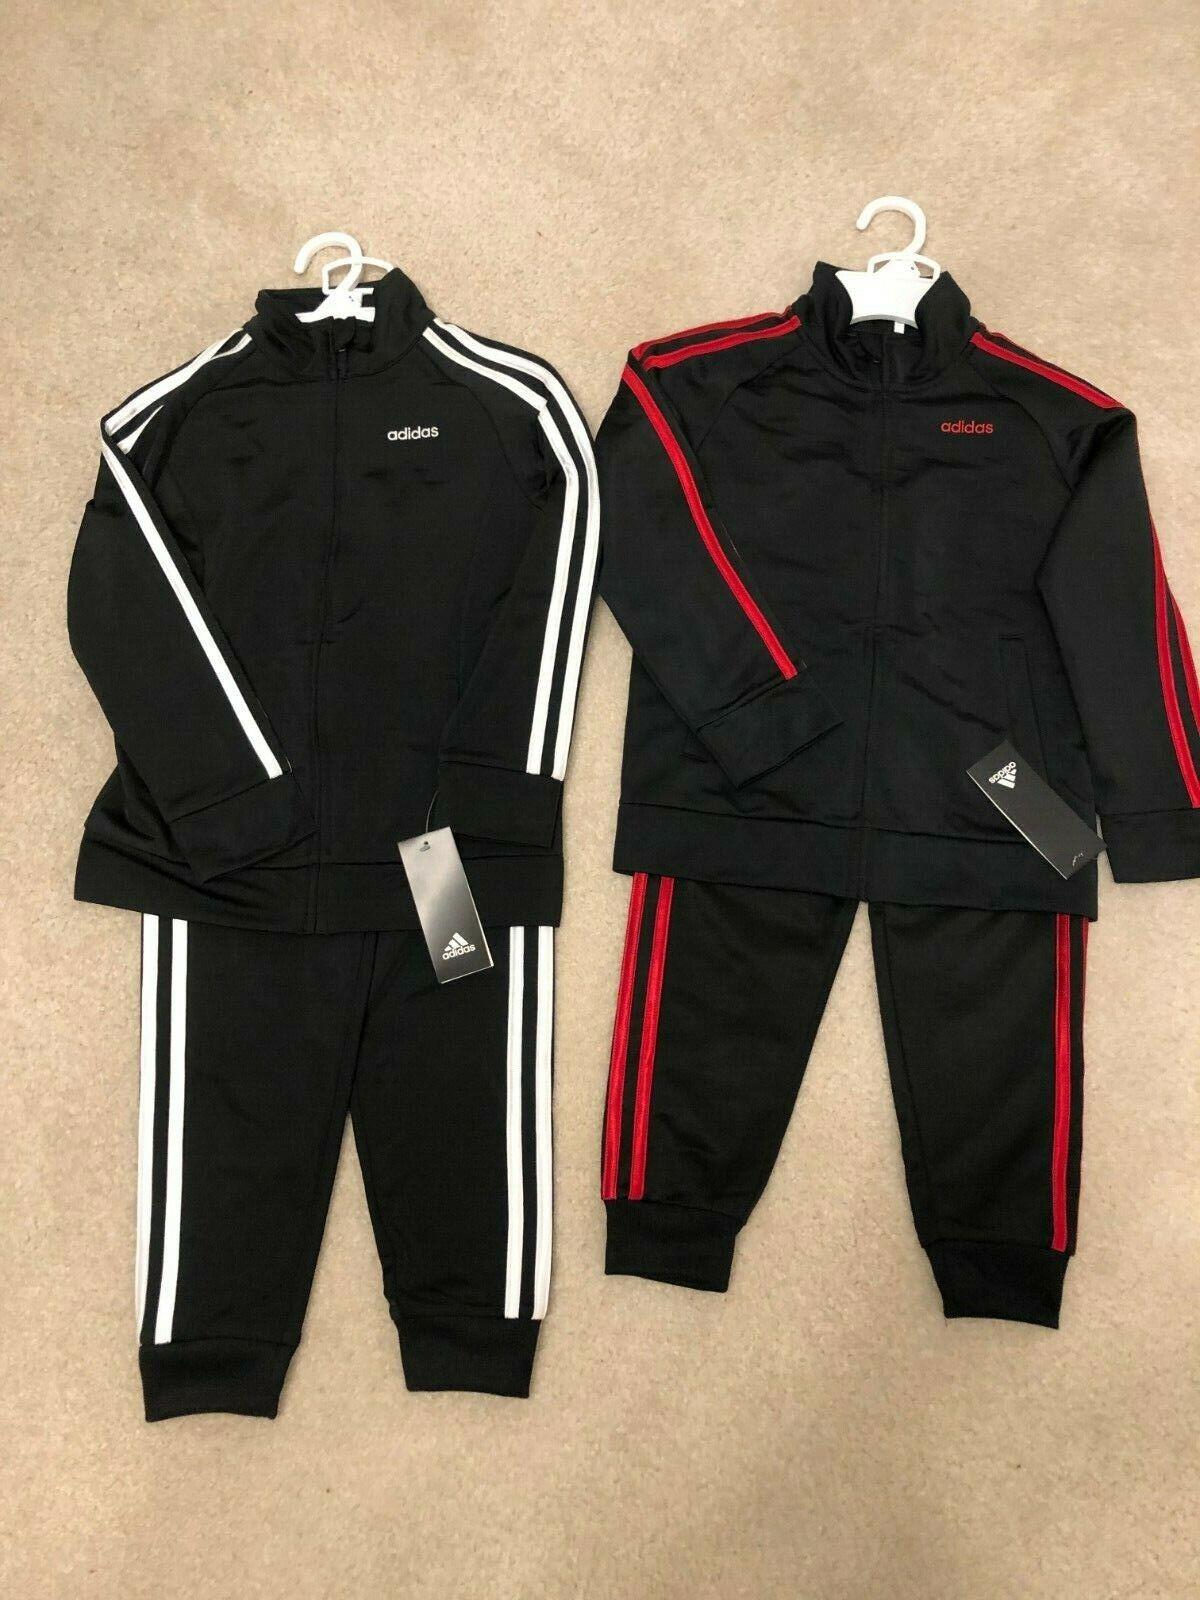 Adidas Boys 3-Stripe Track Suit 2 Piece Jacket and Pants Set